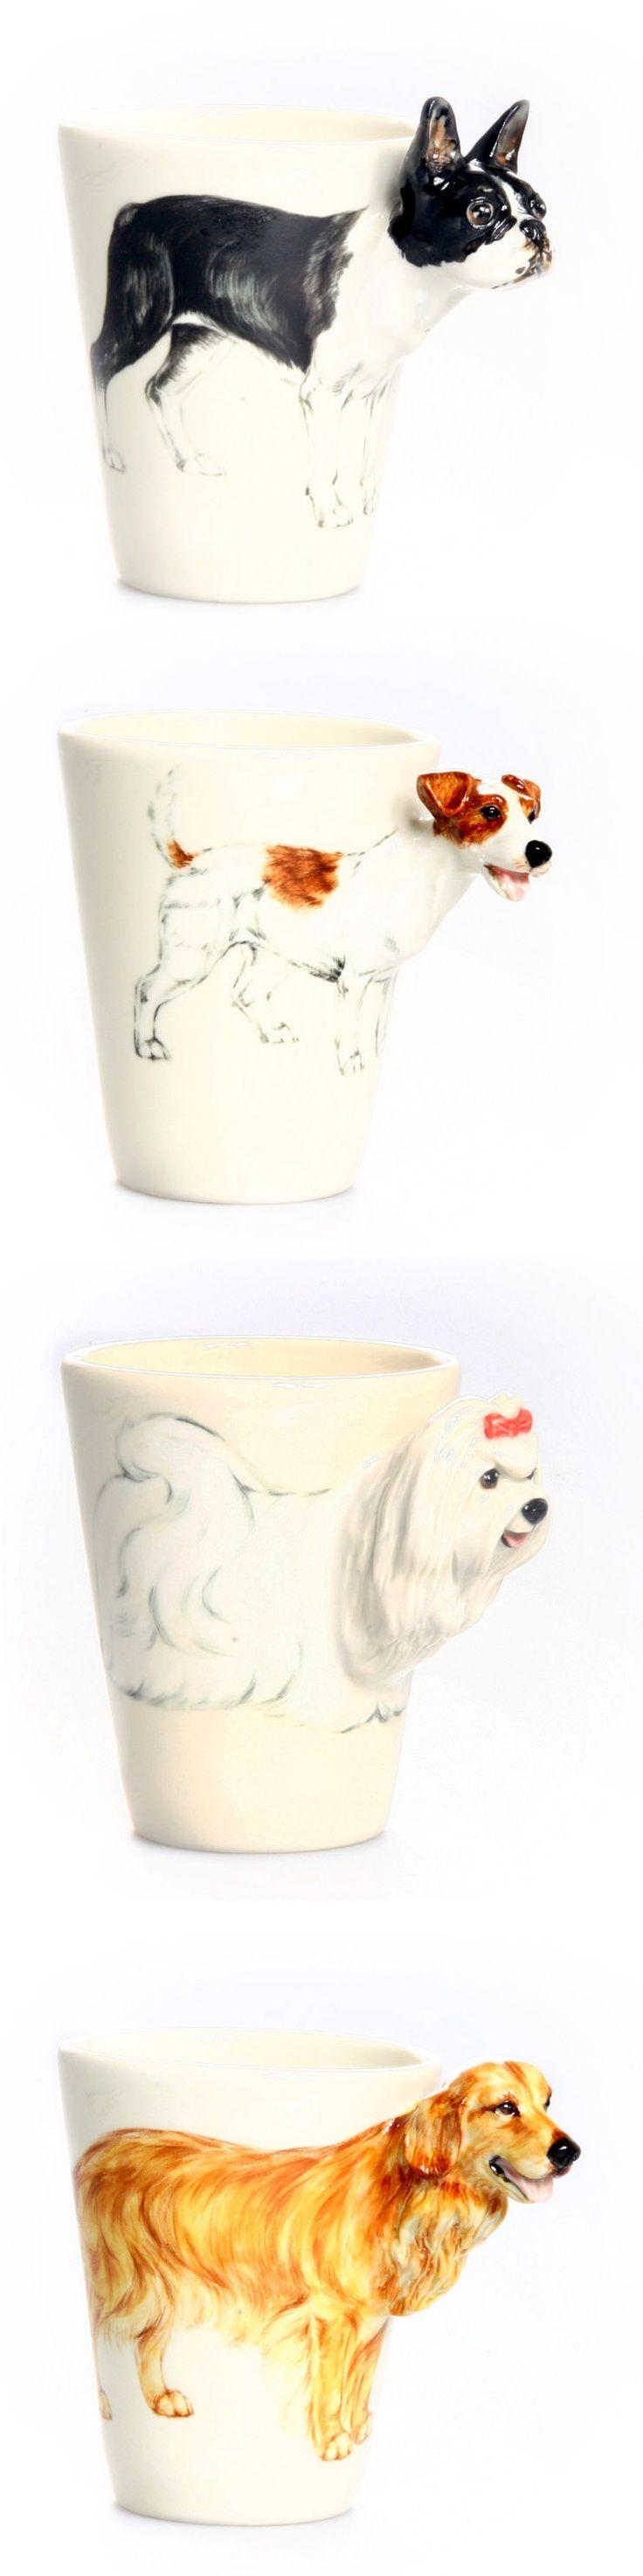 3-D Doggie Mugs